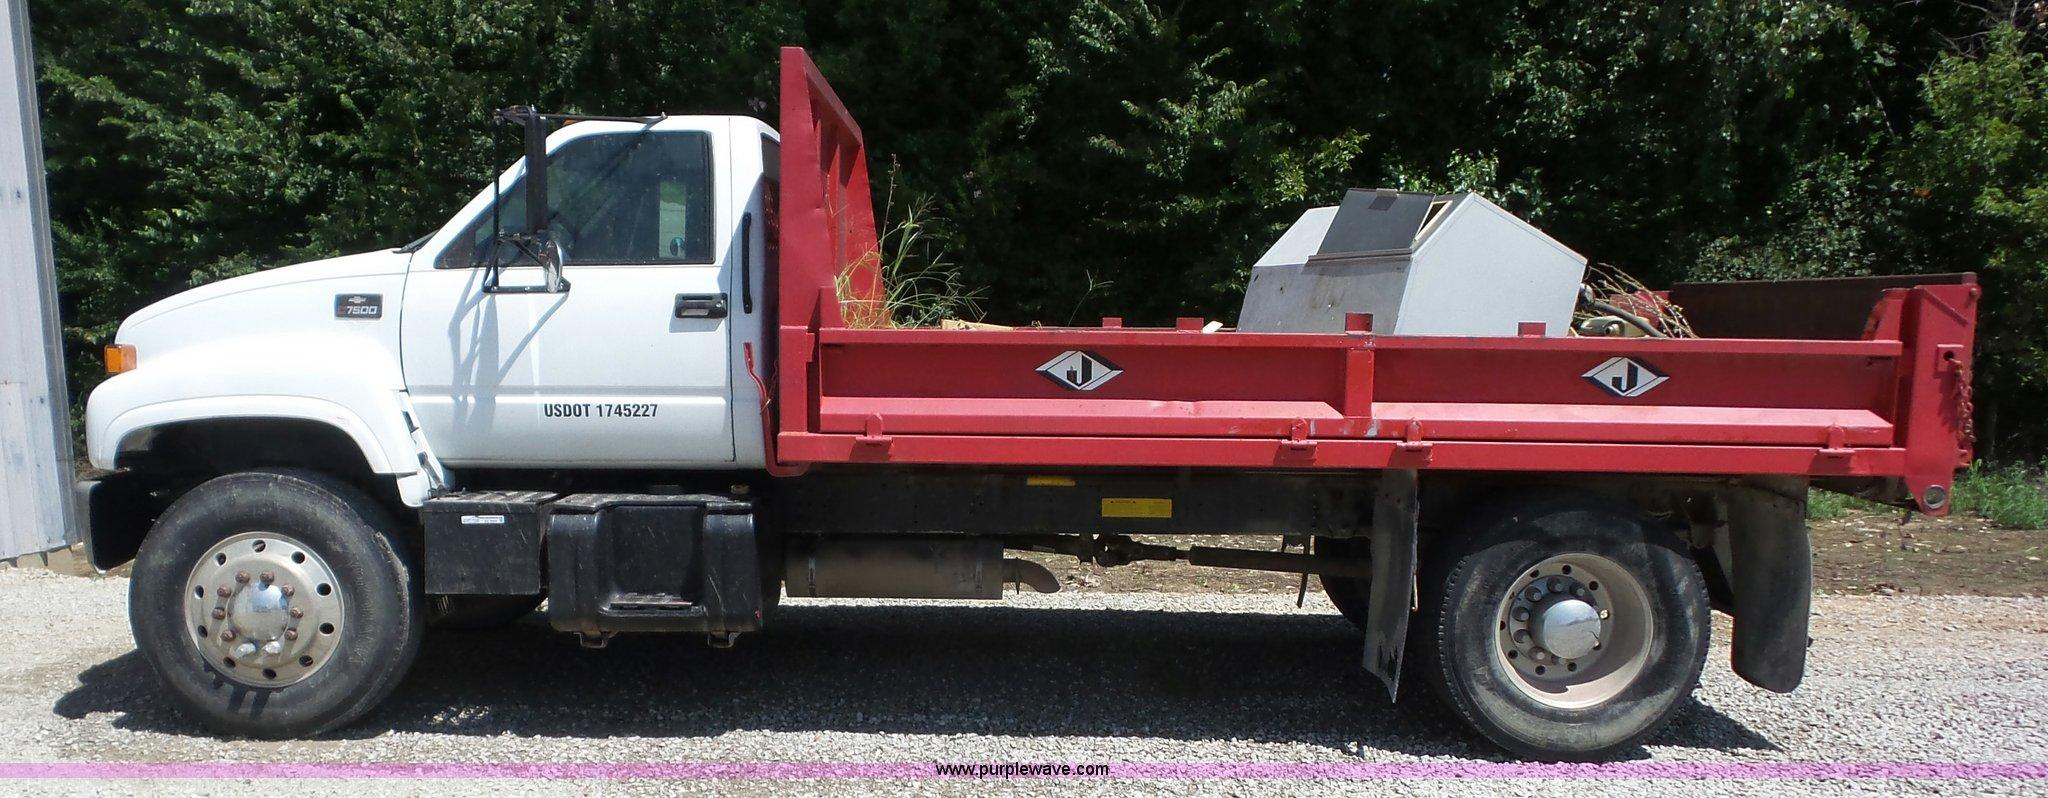 Pickup chevy c7500 pickup : 1999 Chevrolet C7500 dump truck   Item BZ9664   SOLD! Septem...